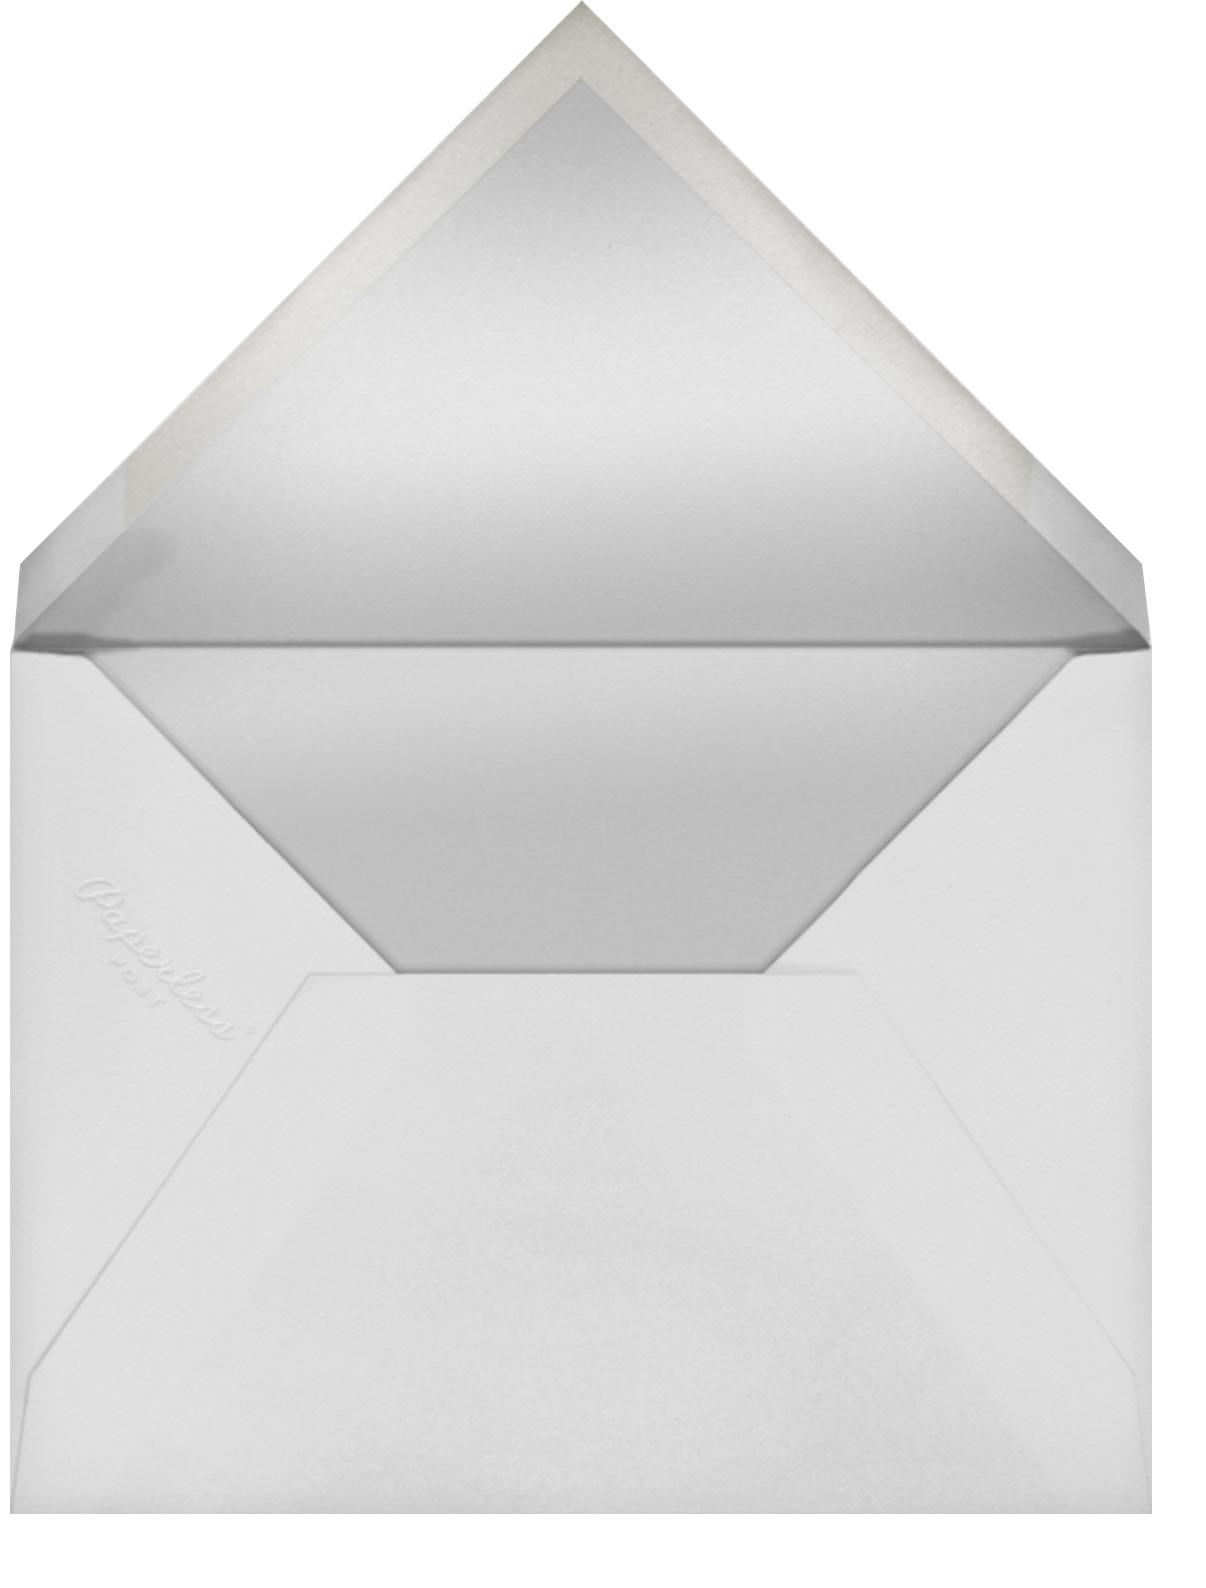 Double Loop Frame I (Menu) - Gold - Paperless Post - Menus - envelope back